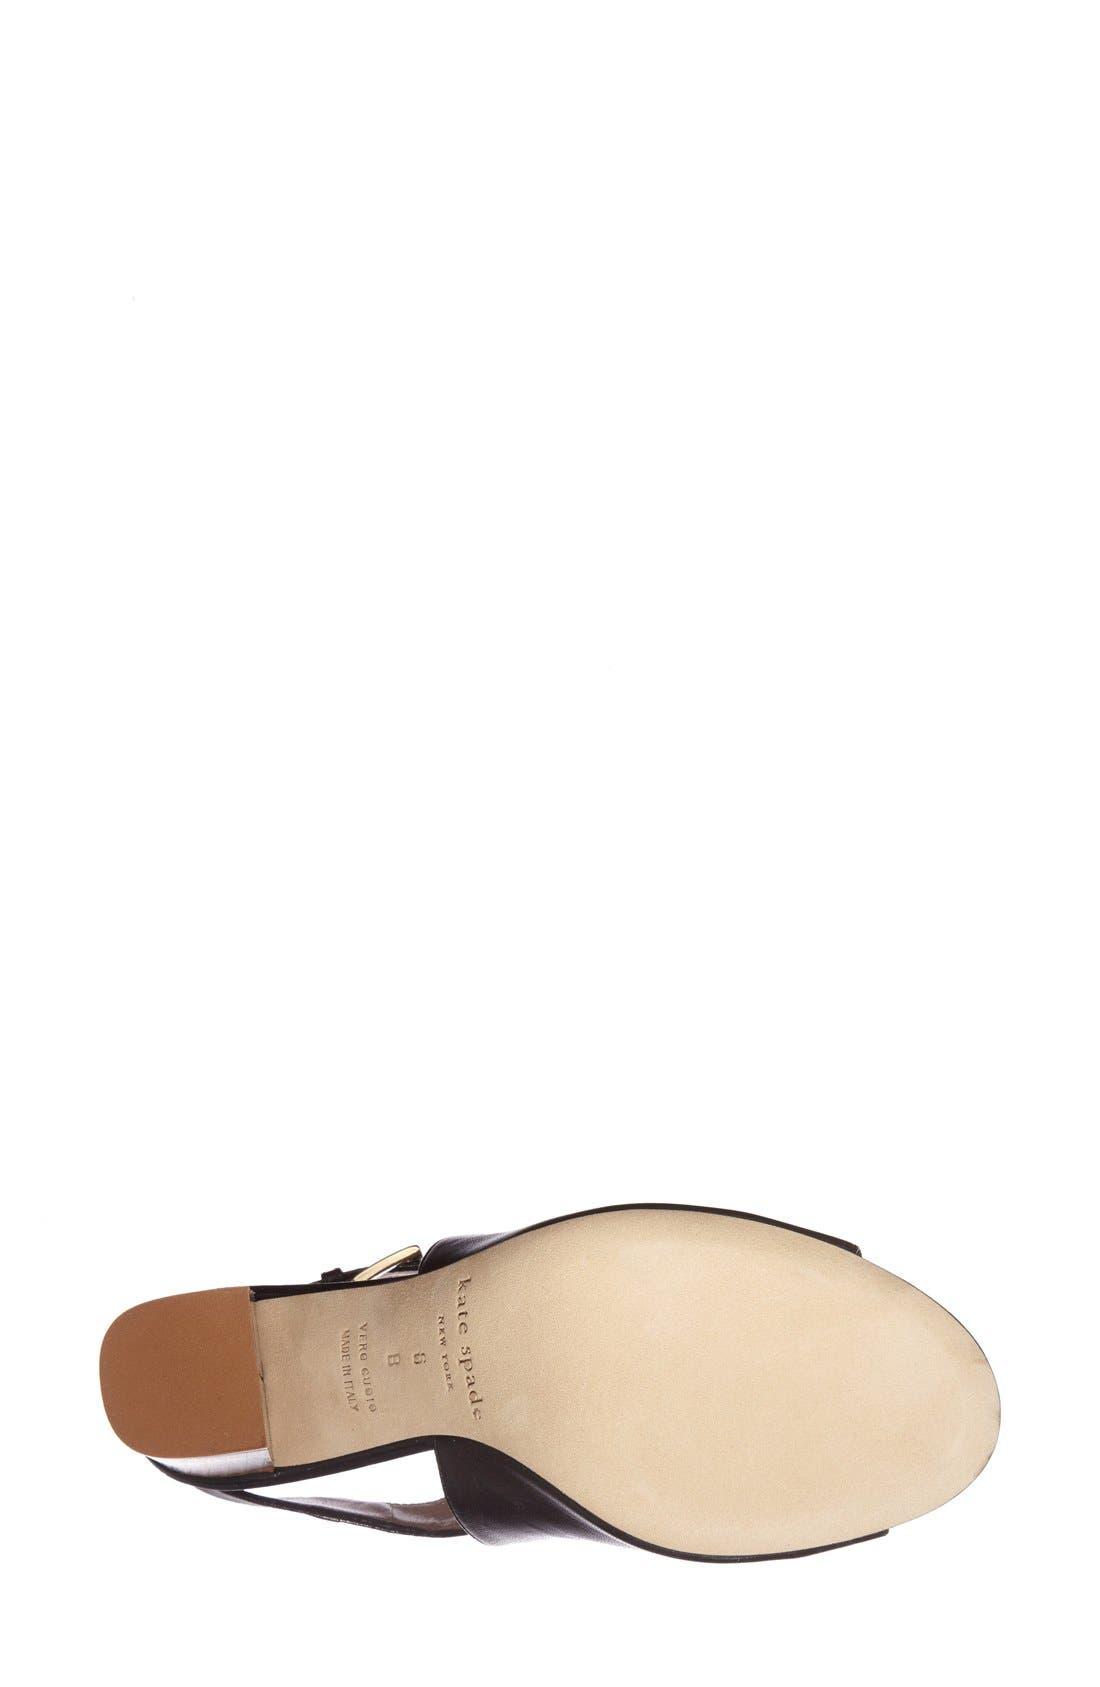 Alternate Image 4  - kate spade new york 'ingrada' slingback sandal (Women)